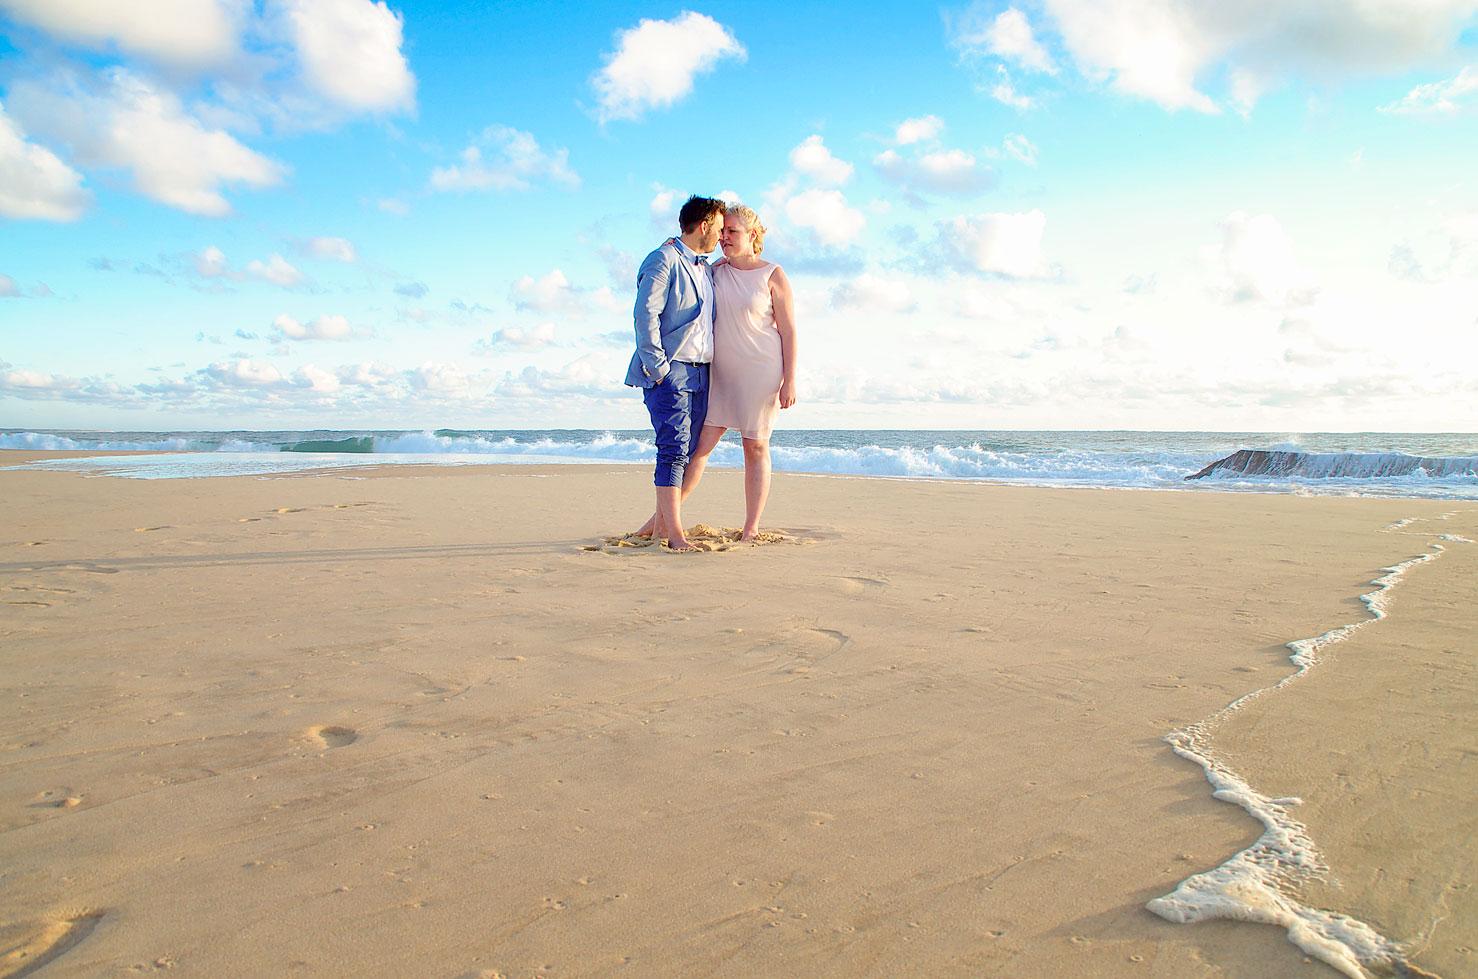 séance couple photo avant mariage